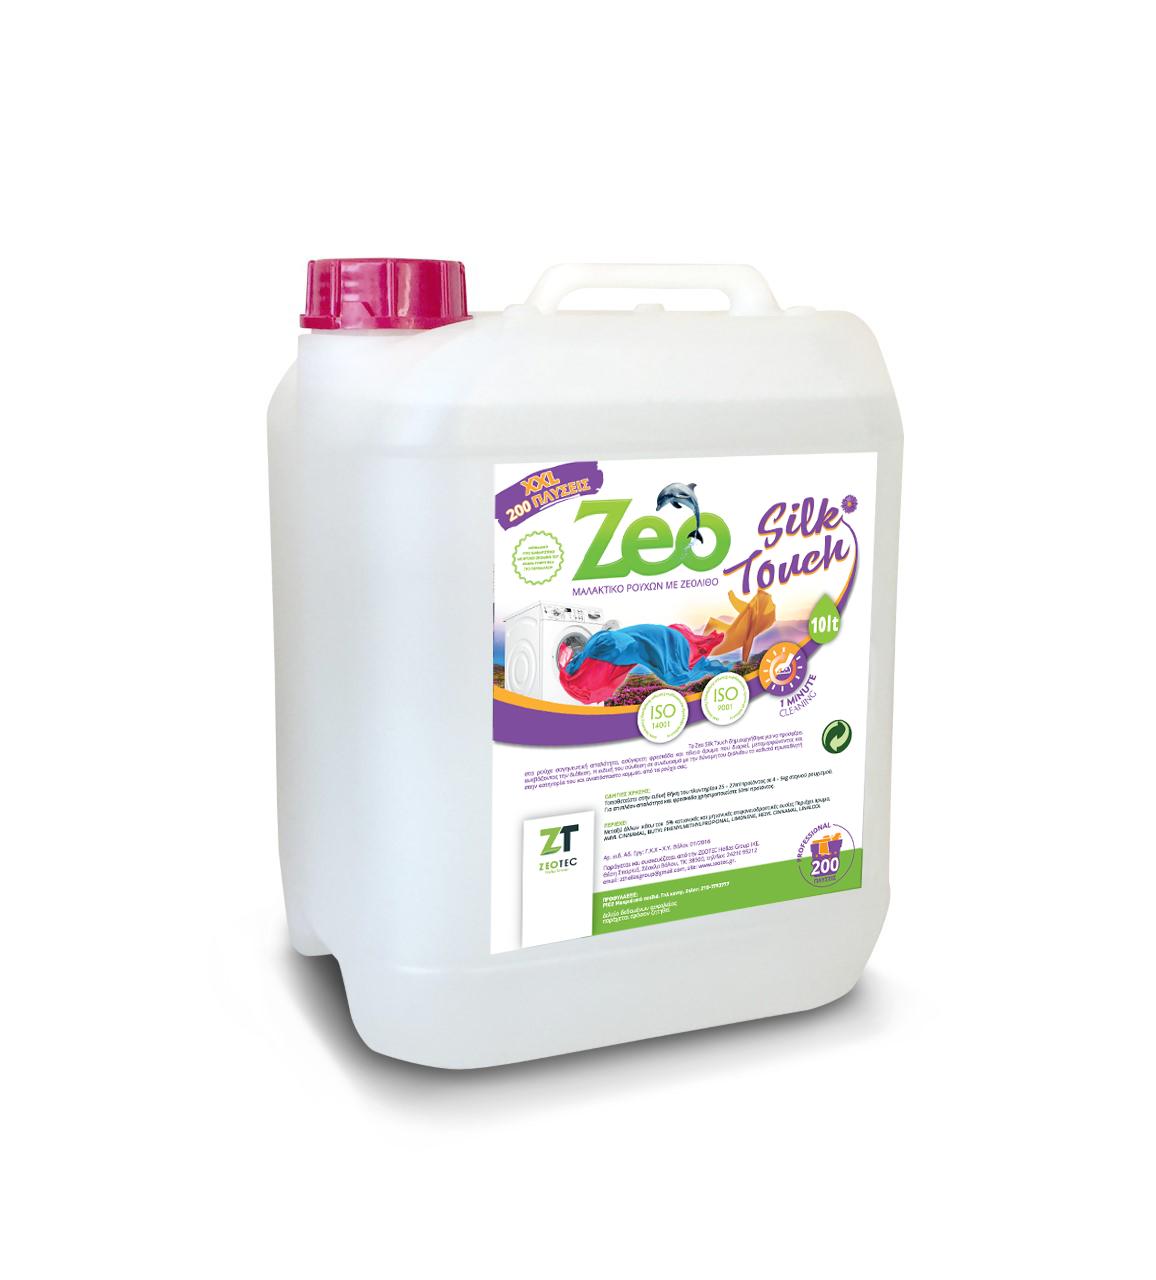 Zeo Silk Touch - Μαλακτικό πλυντηρίου ρούχων με άρωμα λουλουδιών και νότες Ανατολής 20lt